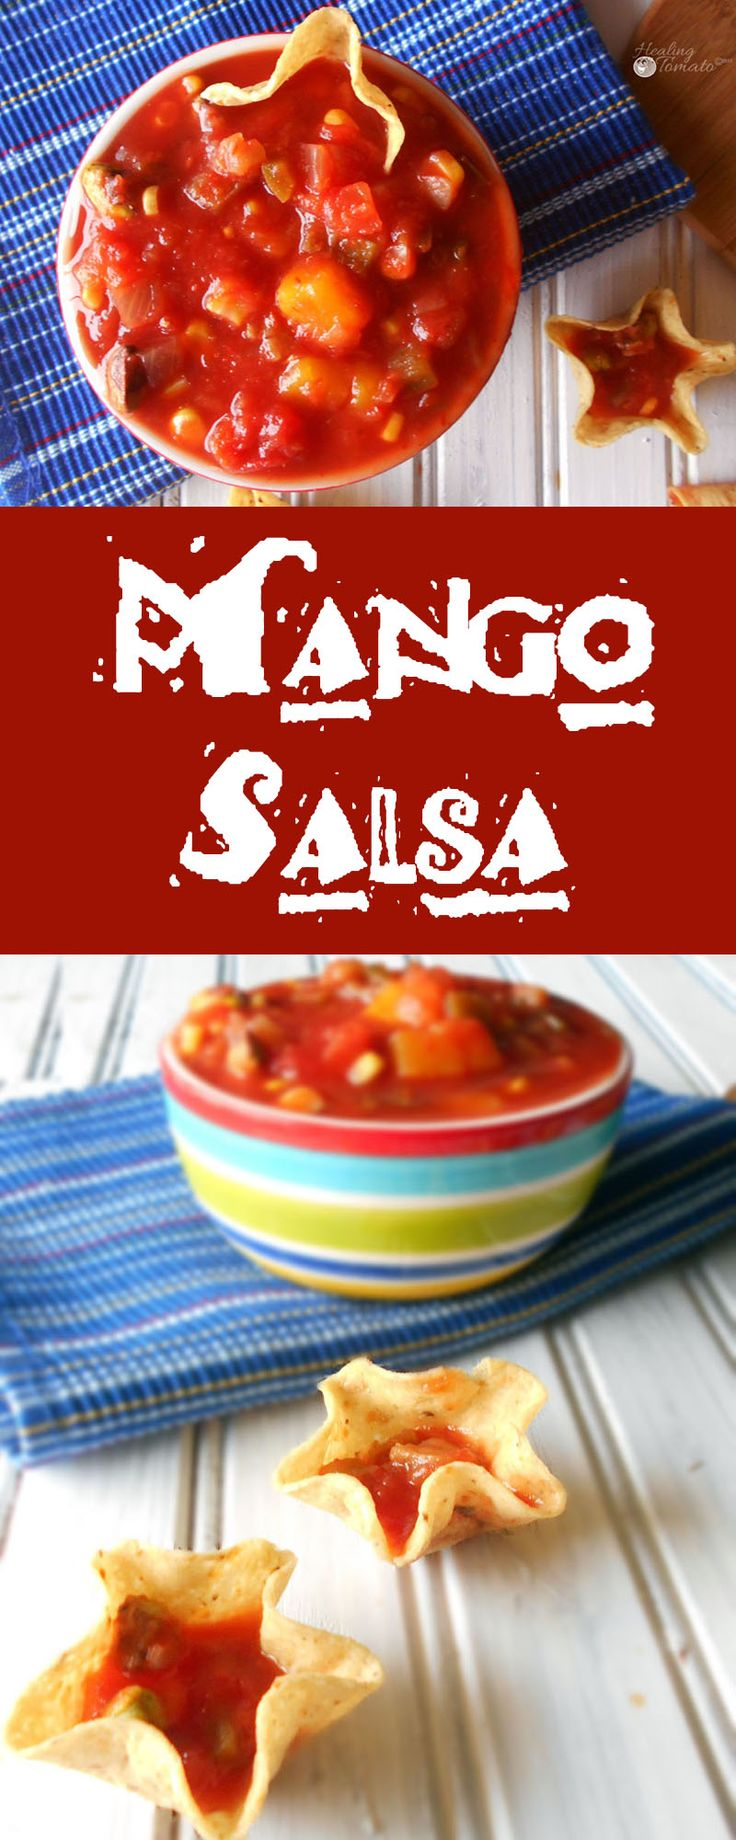 Hf ideas parrillas y asados - Mango Taco Boats For Game Day